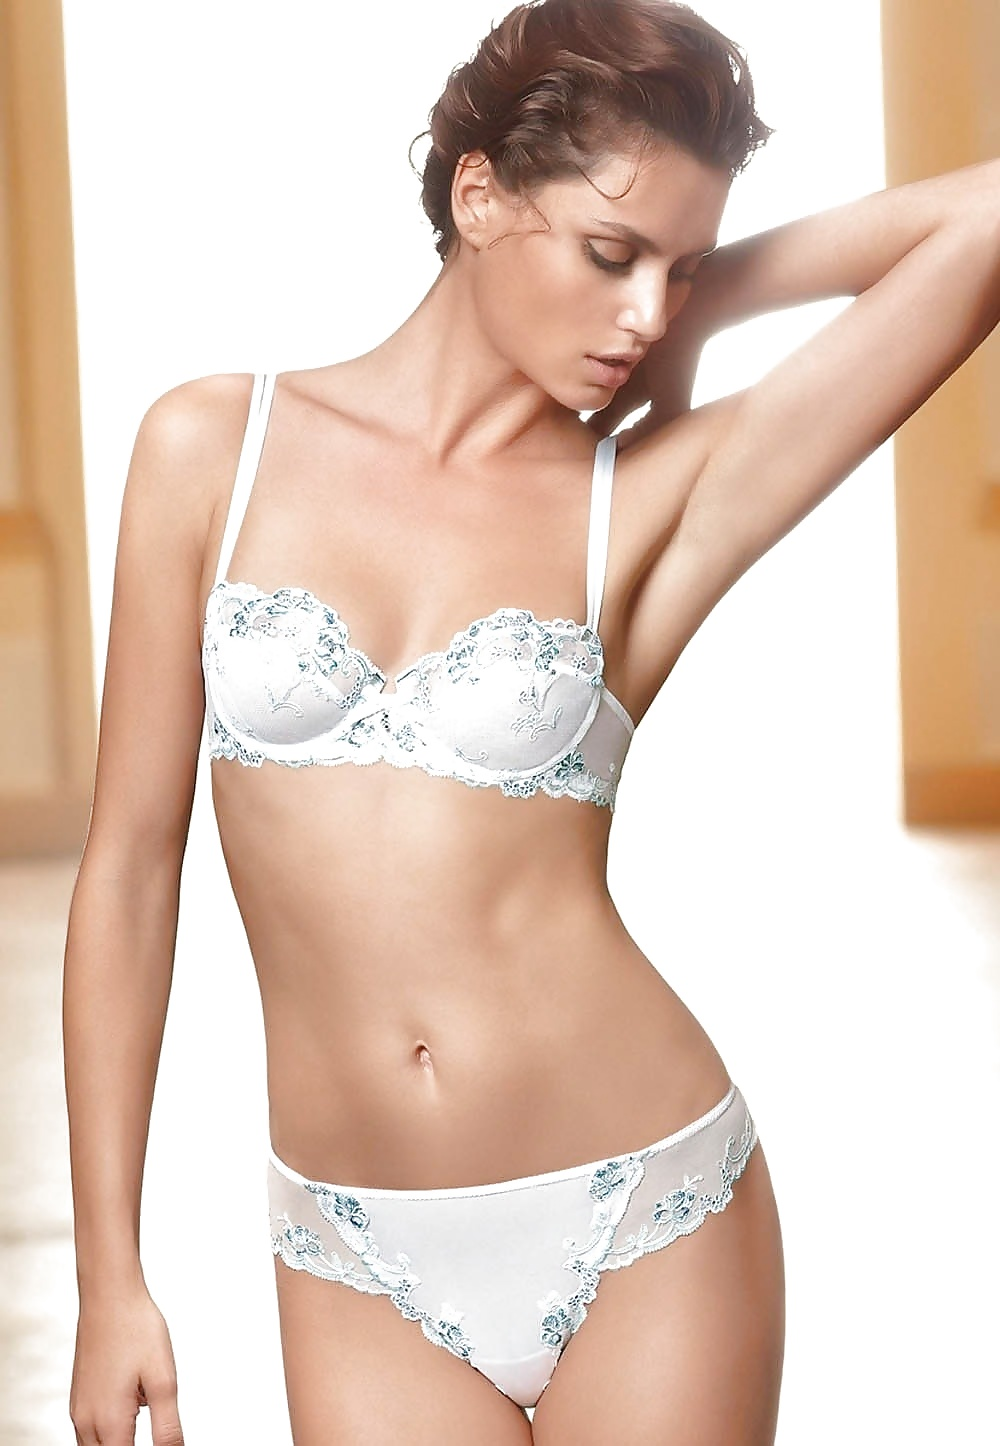 Boobs Claire Julien nude (45 foto) Hacked, iCloud, bra